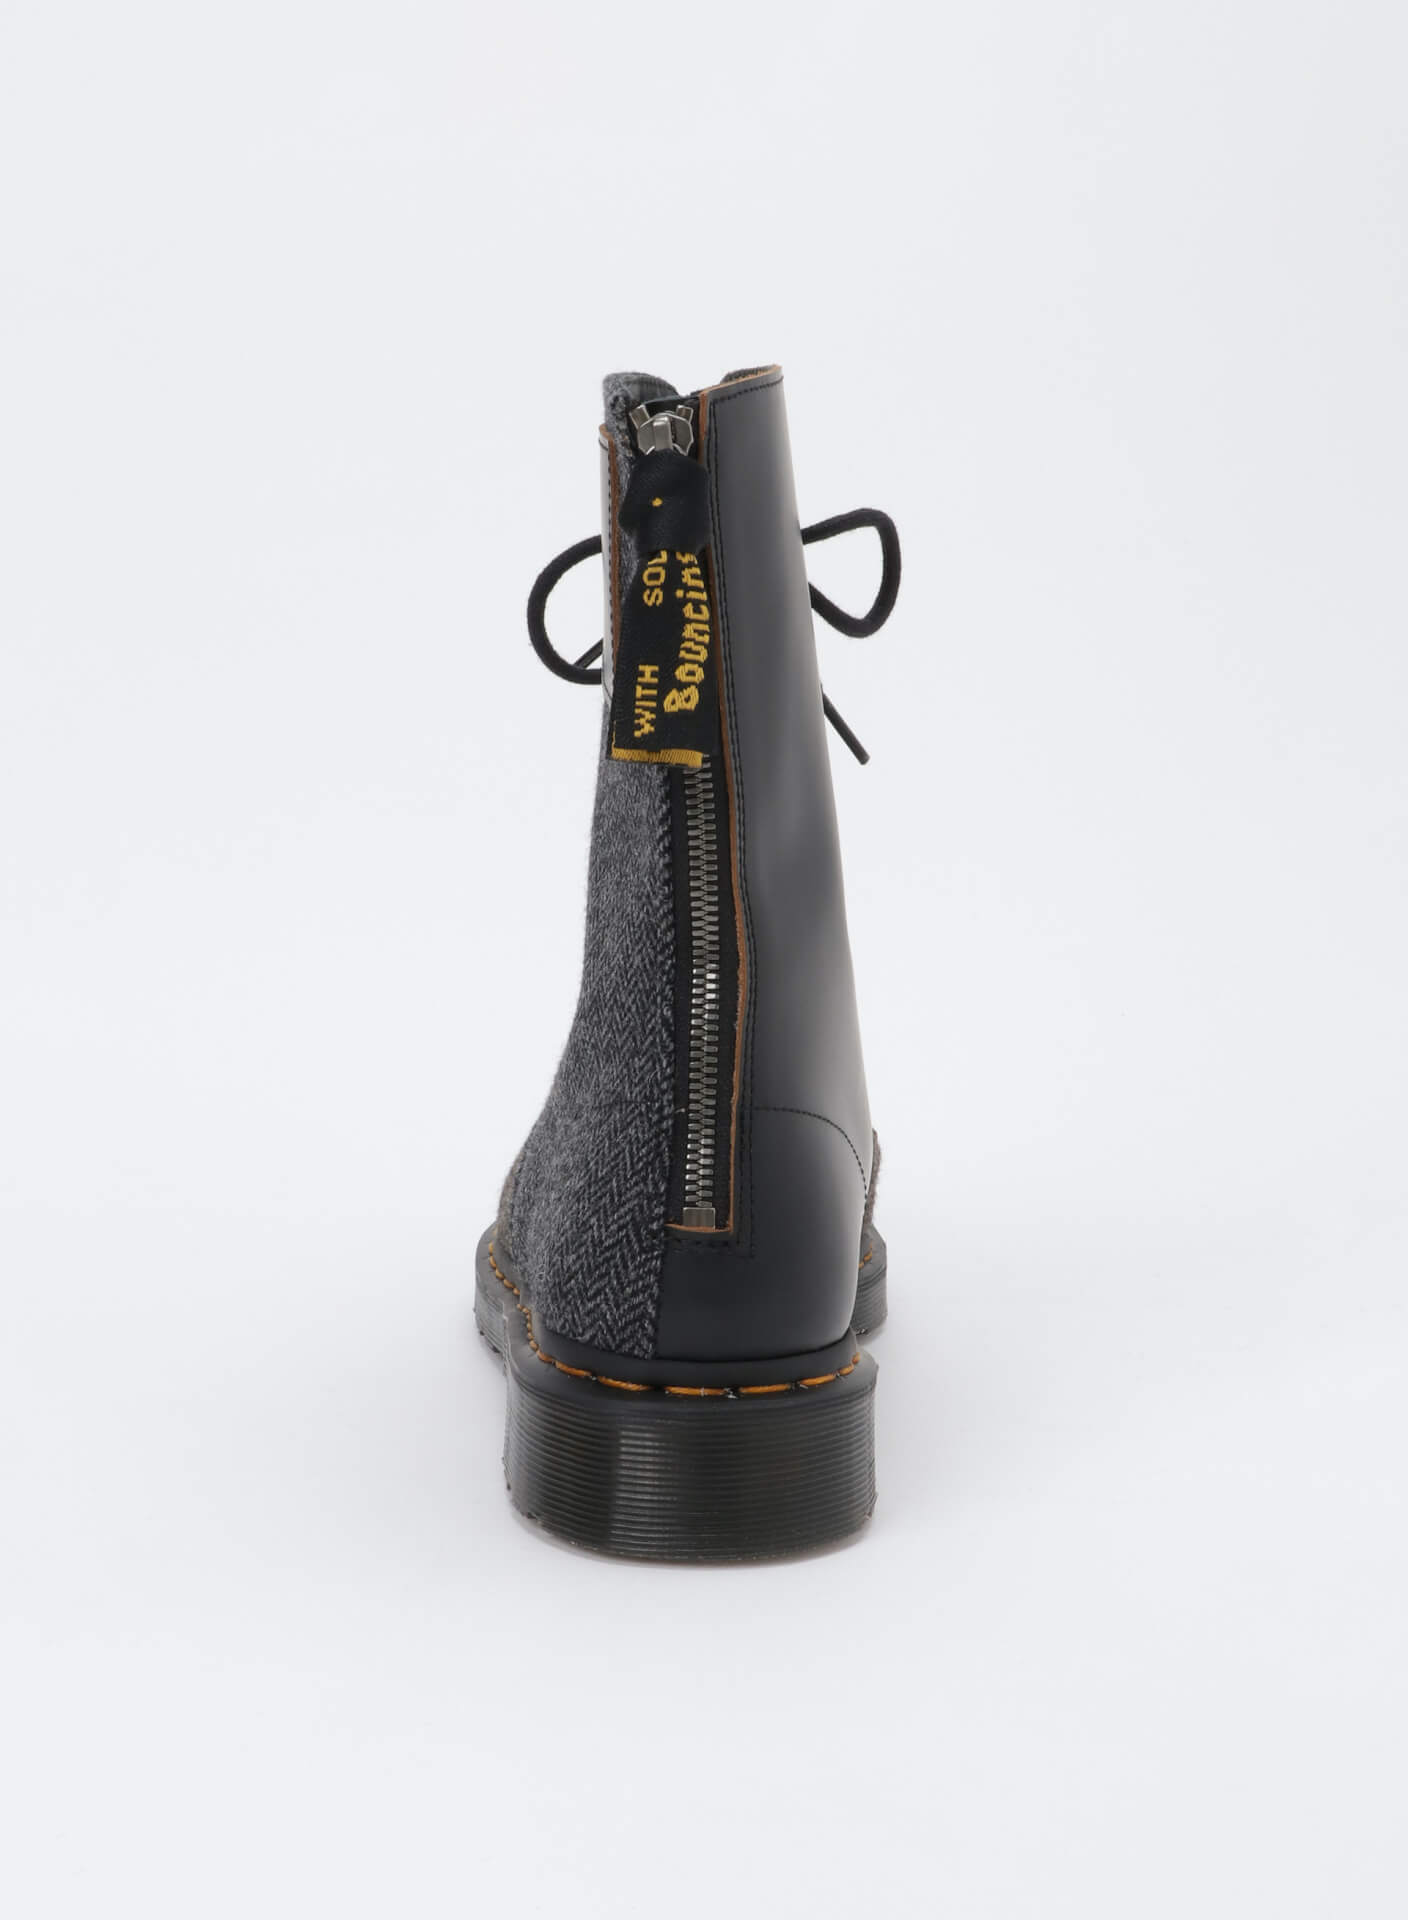 Y'sとドクターマーチンによる最新コレクション「Y's × Dr.Martens 10-EYE BOOT MOON FABRIC」が発売! a802e01bb14a9d51d07b98101ed8223f